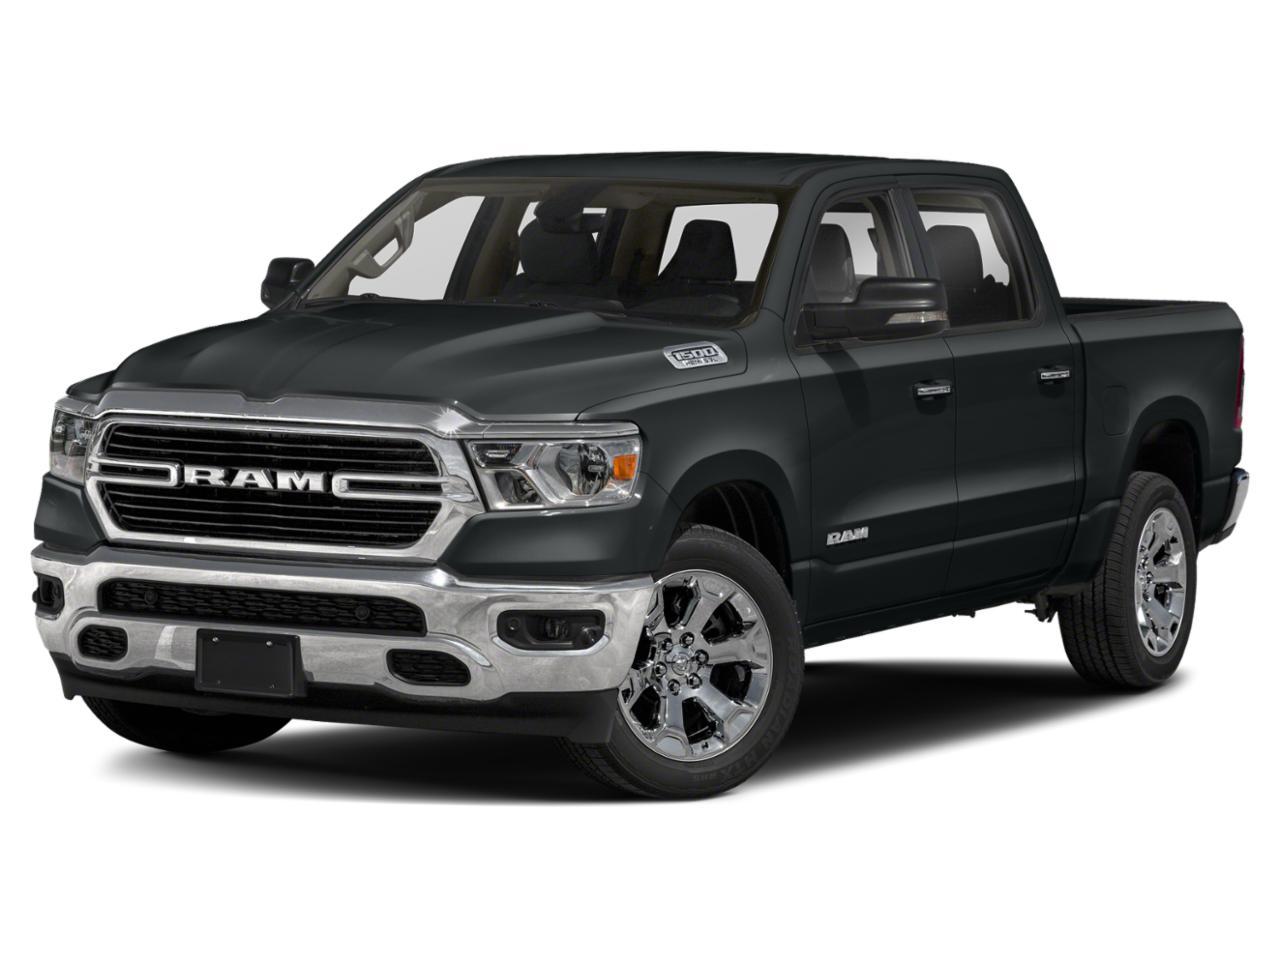 2020 Ram 1500 Vehicle Photo in SELMA, TX 78154-1459